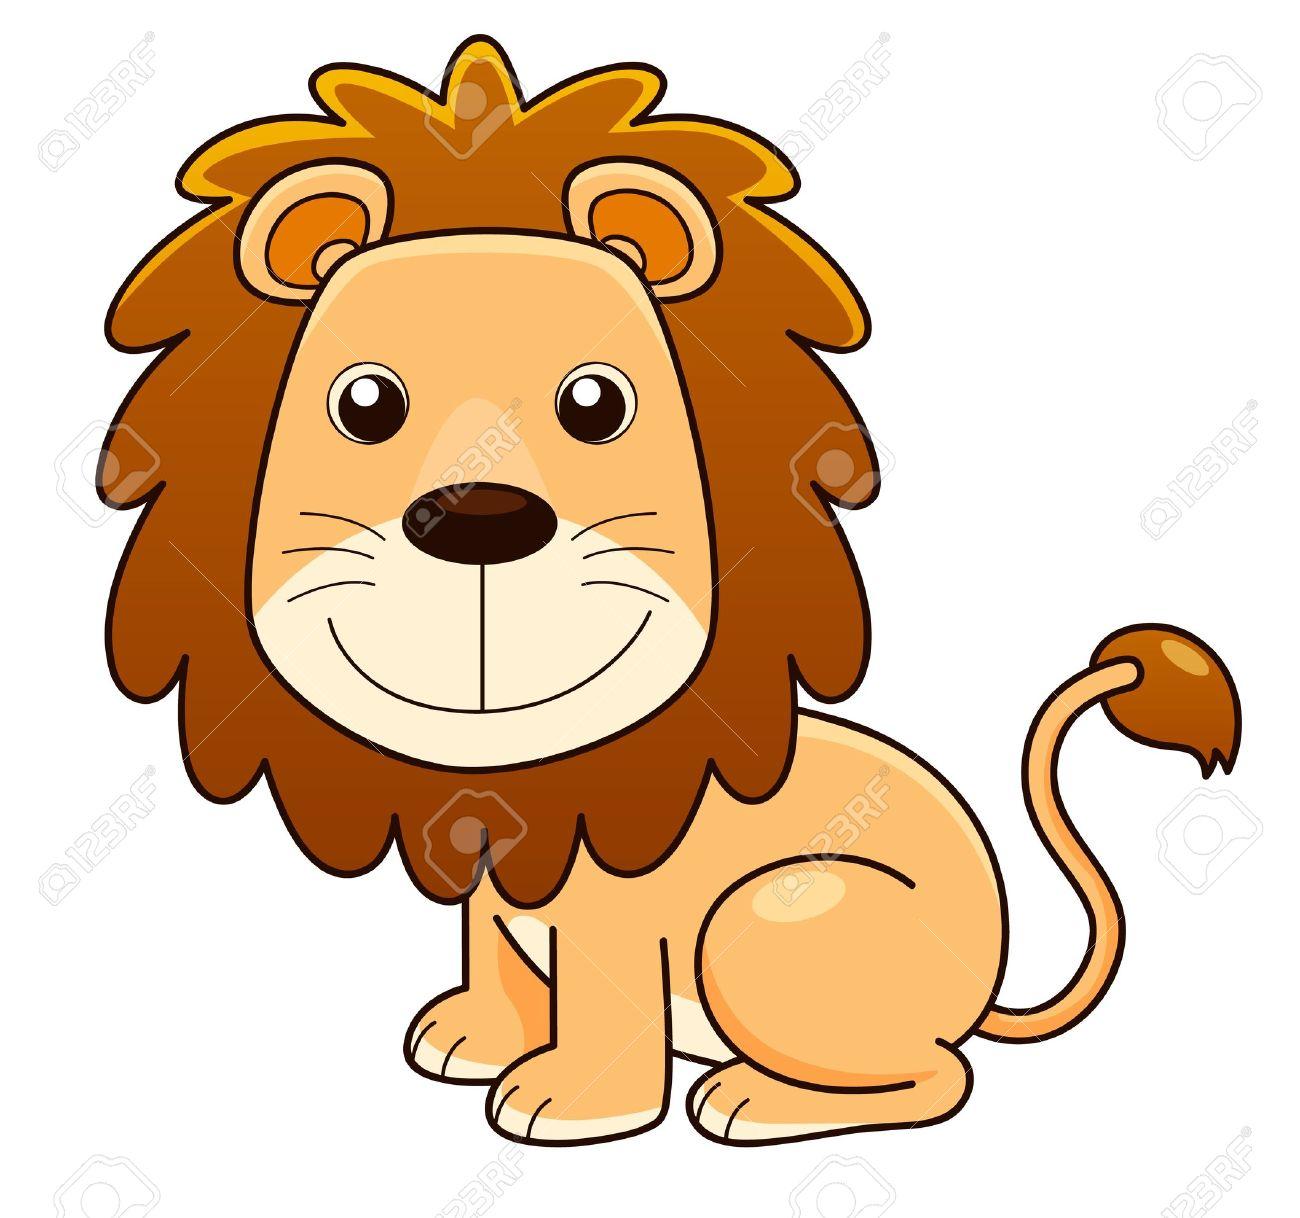 illustration of lion cartoon vector royalty free cliparts vectors rh 123rf com cartoon lion images download lion cartoon images hd